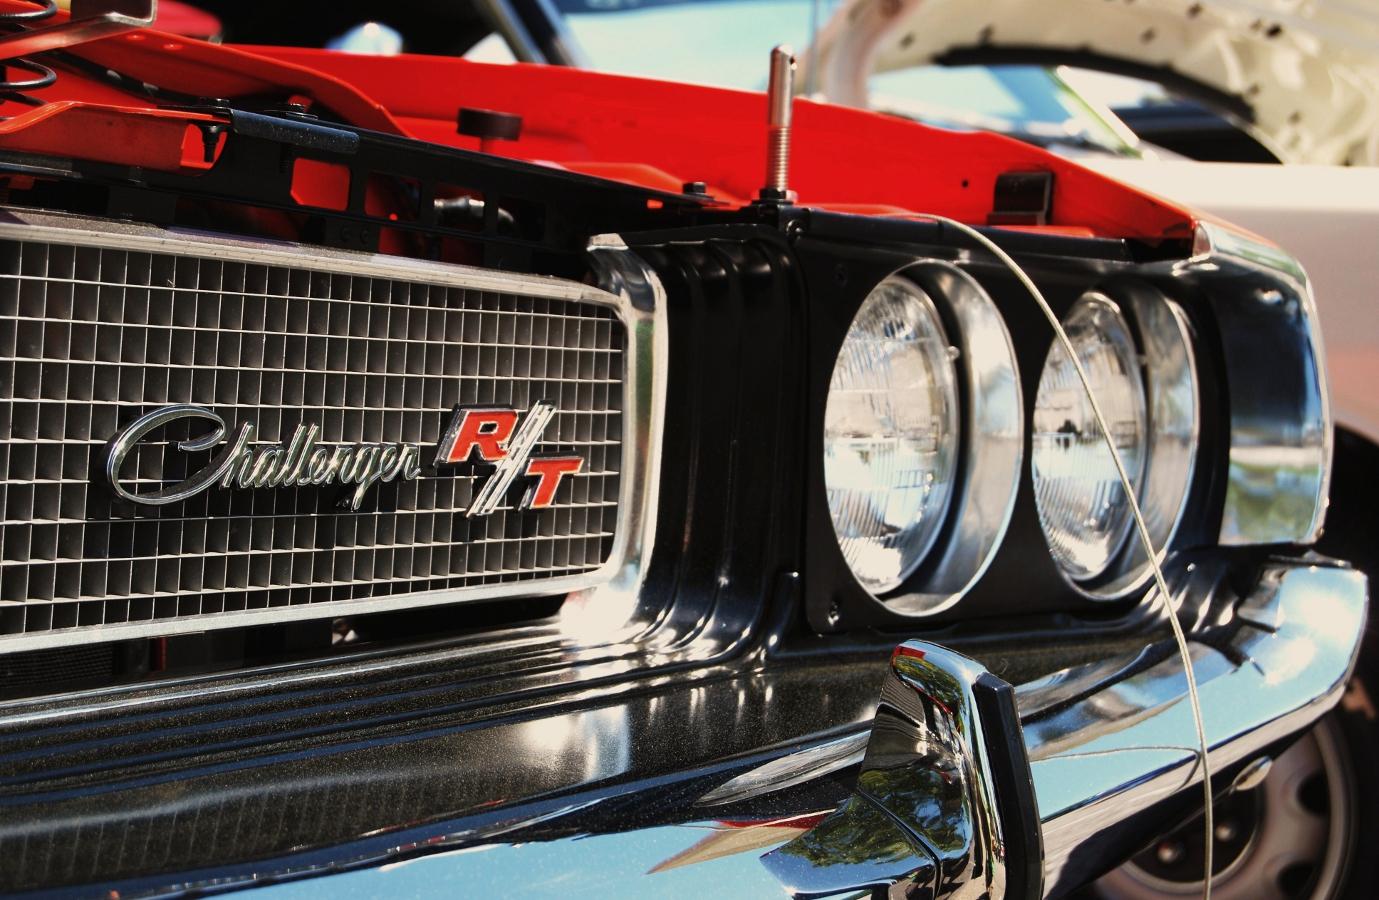 Vehicles Dodge Challenger RT 1379x900